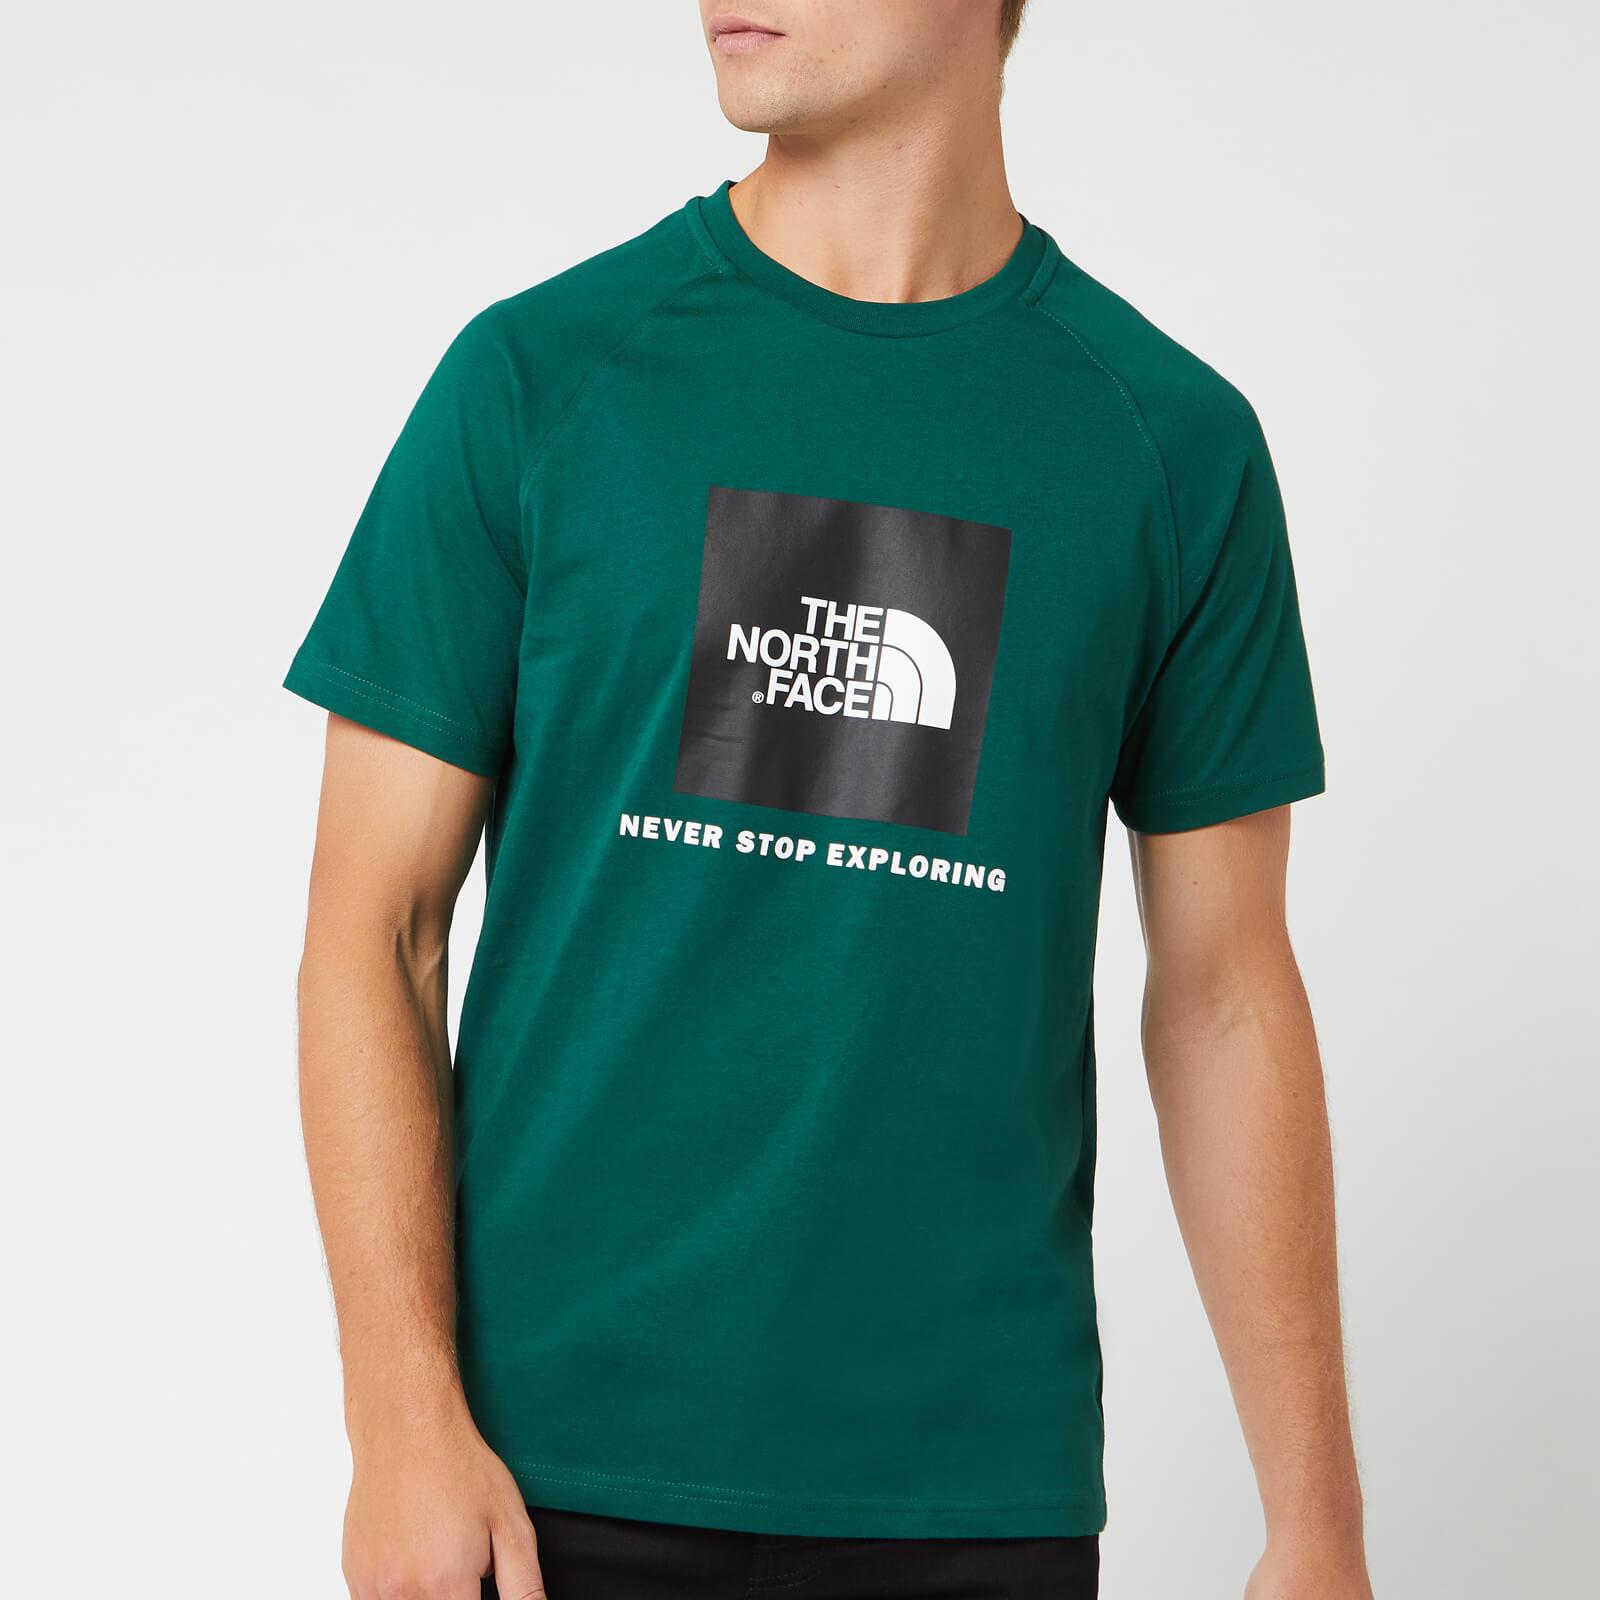 6cdf50be9 The North Face Men's Short Sleeve Raglan Redbox T-Shirt - Night Green